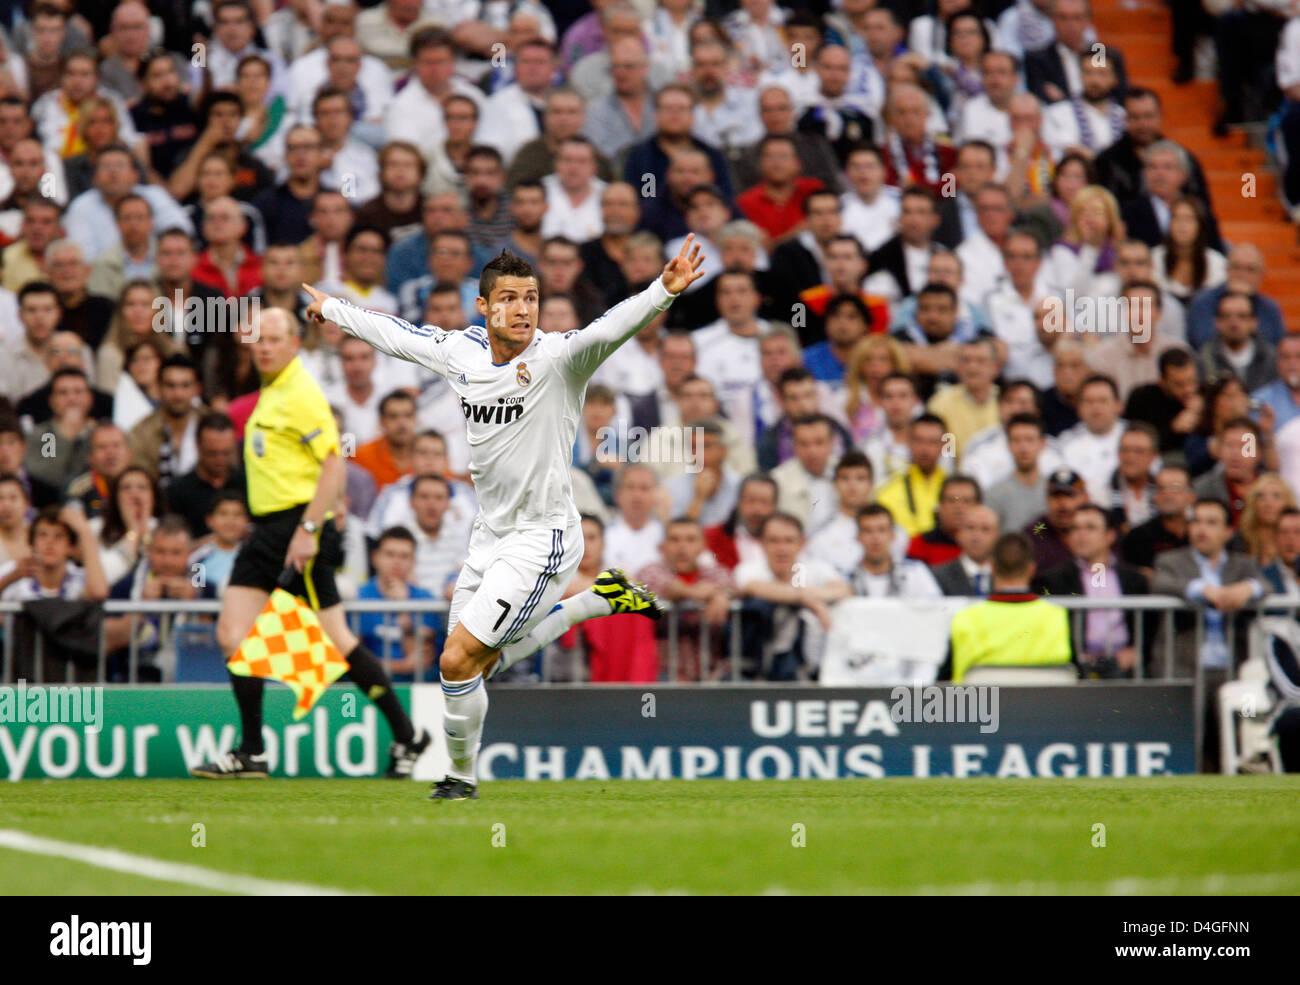 Madrid, Spain, Cristiano Ronaldo, Real Madrid CF, the semifinals of the UEFA Champions League - Stock Image